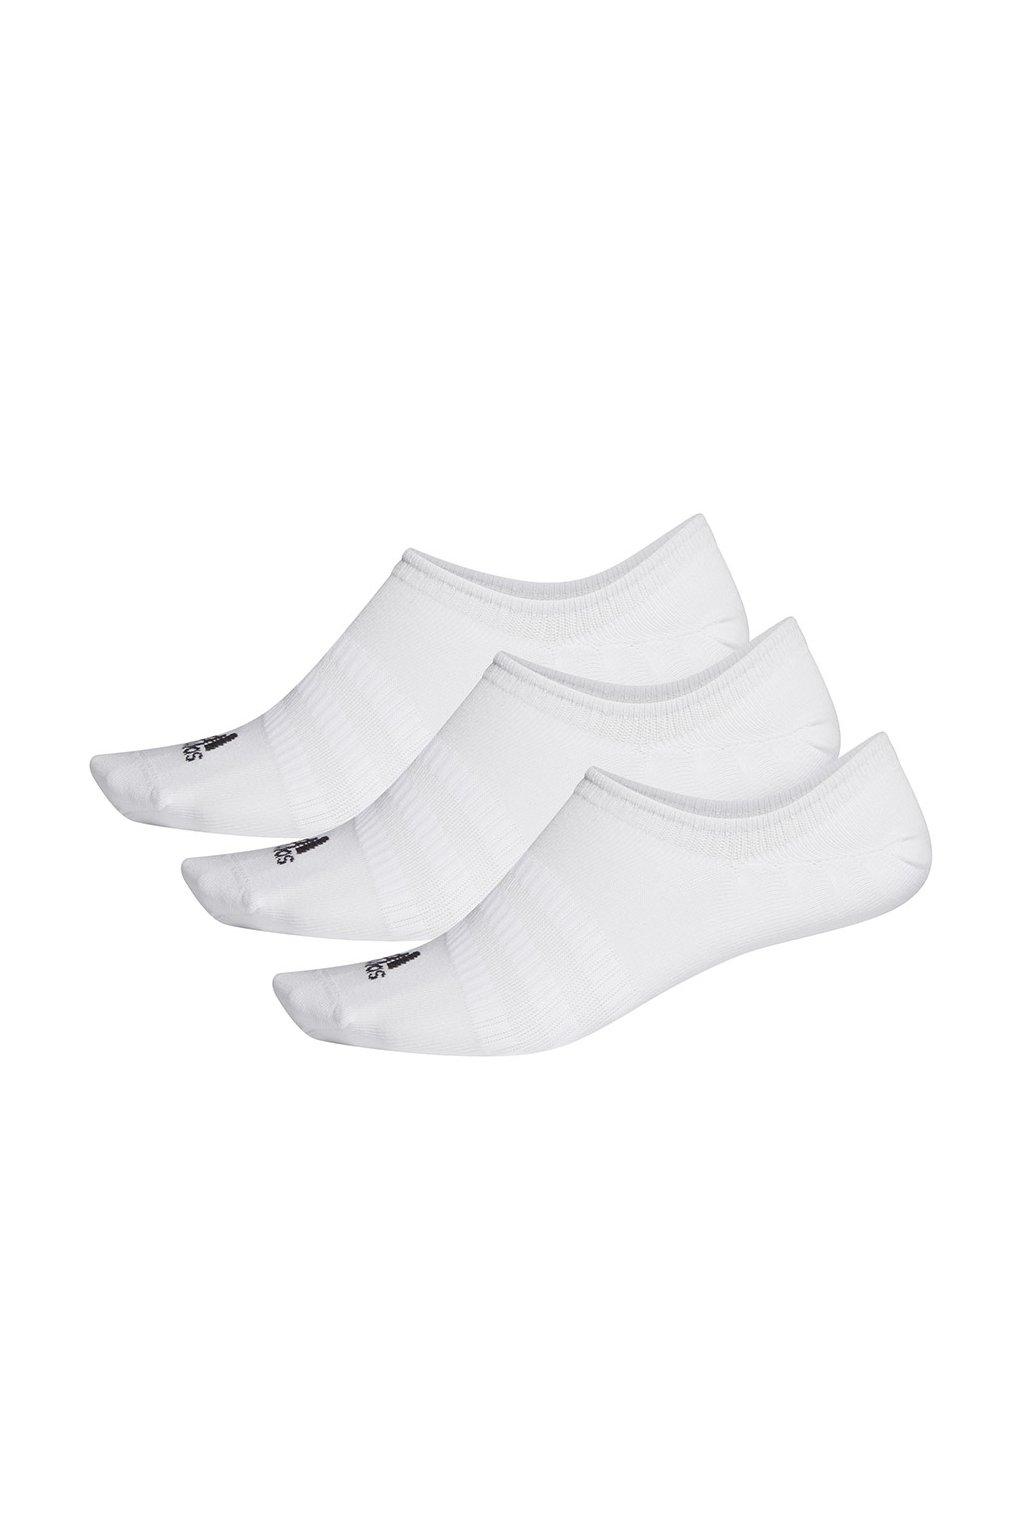 Ponožky adidas Light Nosh 3PP DZ9415 biele